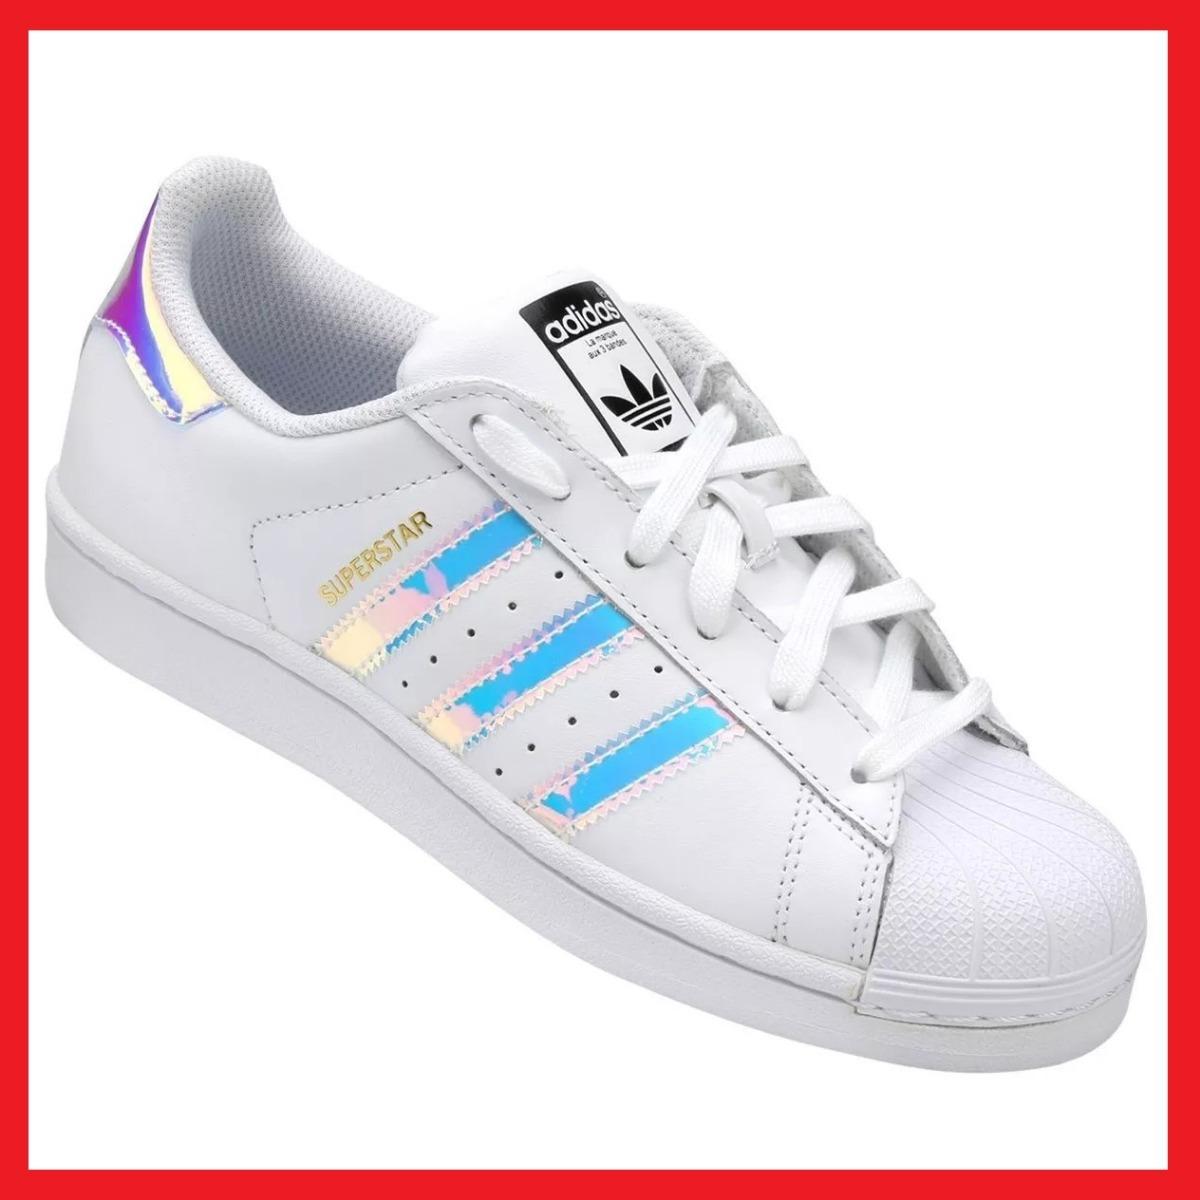 tenis adidas superstar tornasol iridescent con caja enviogra. Cargando zoom. 6f2445f44909a